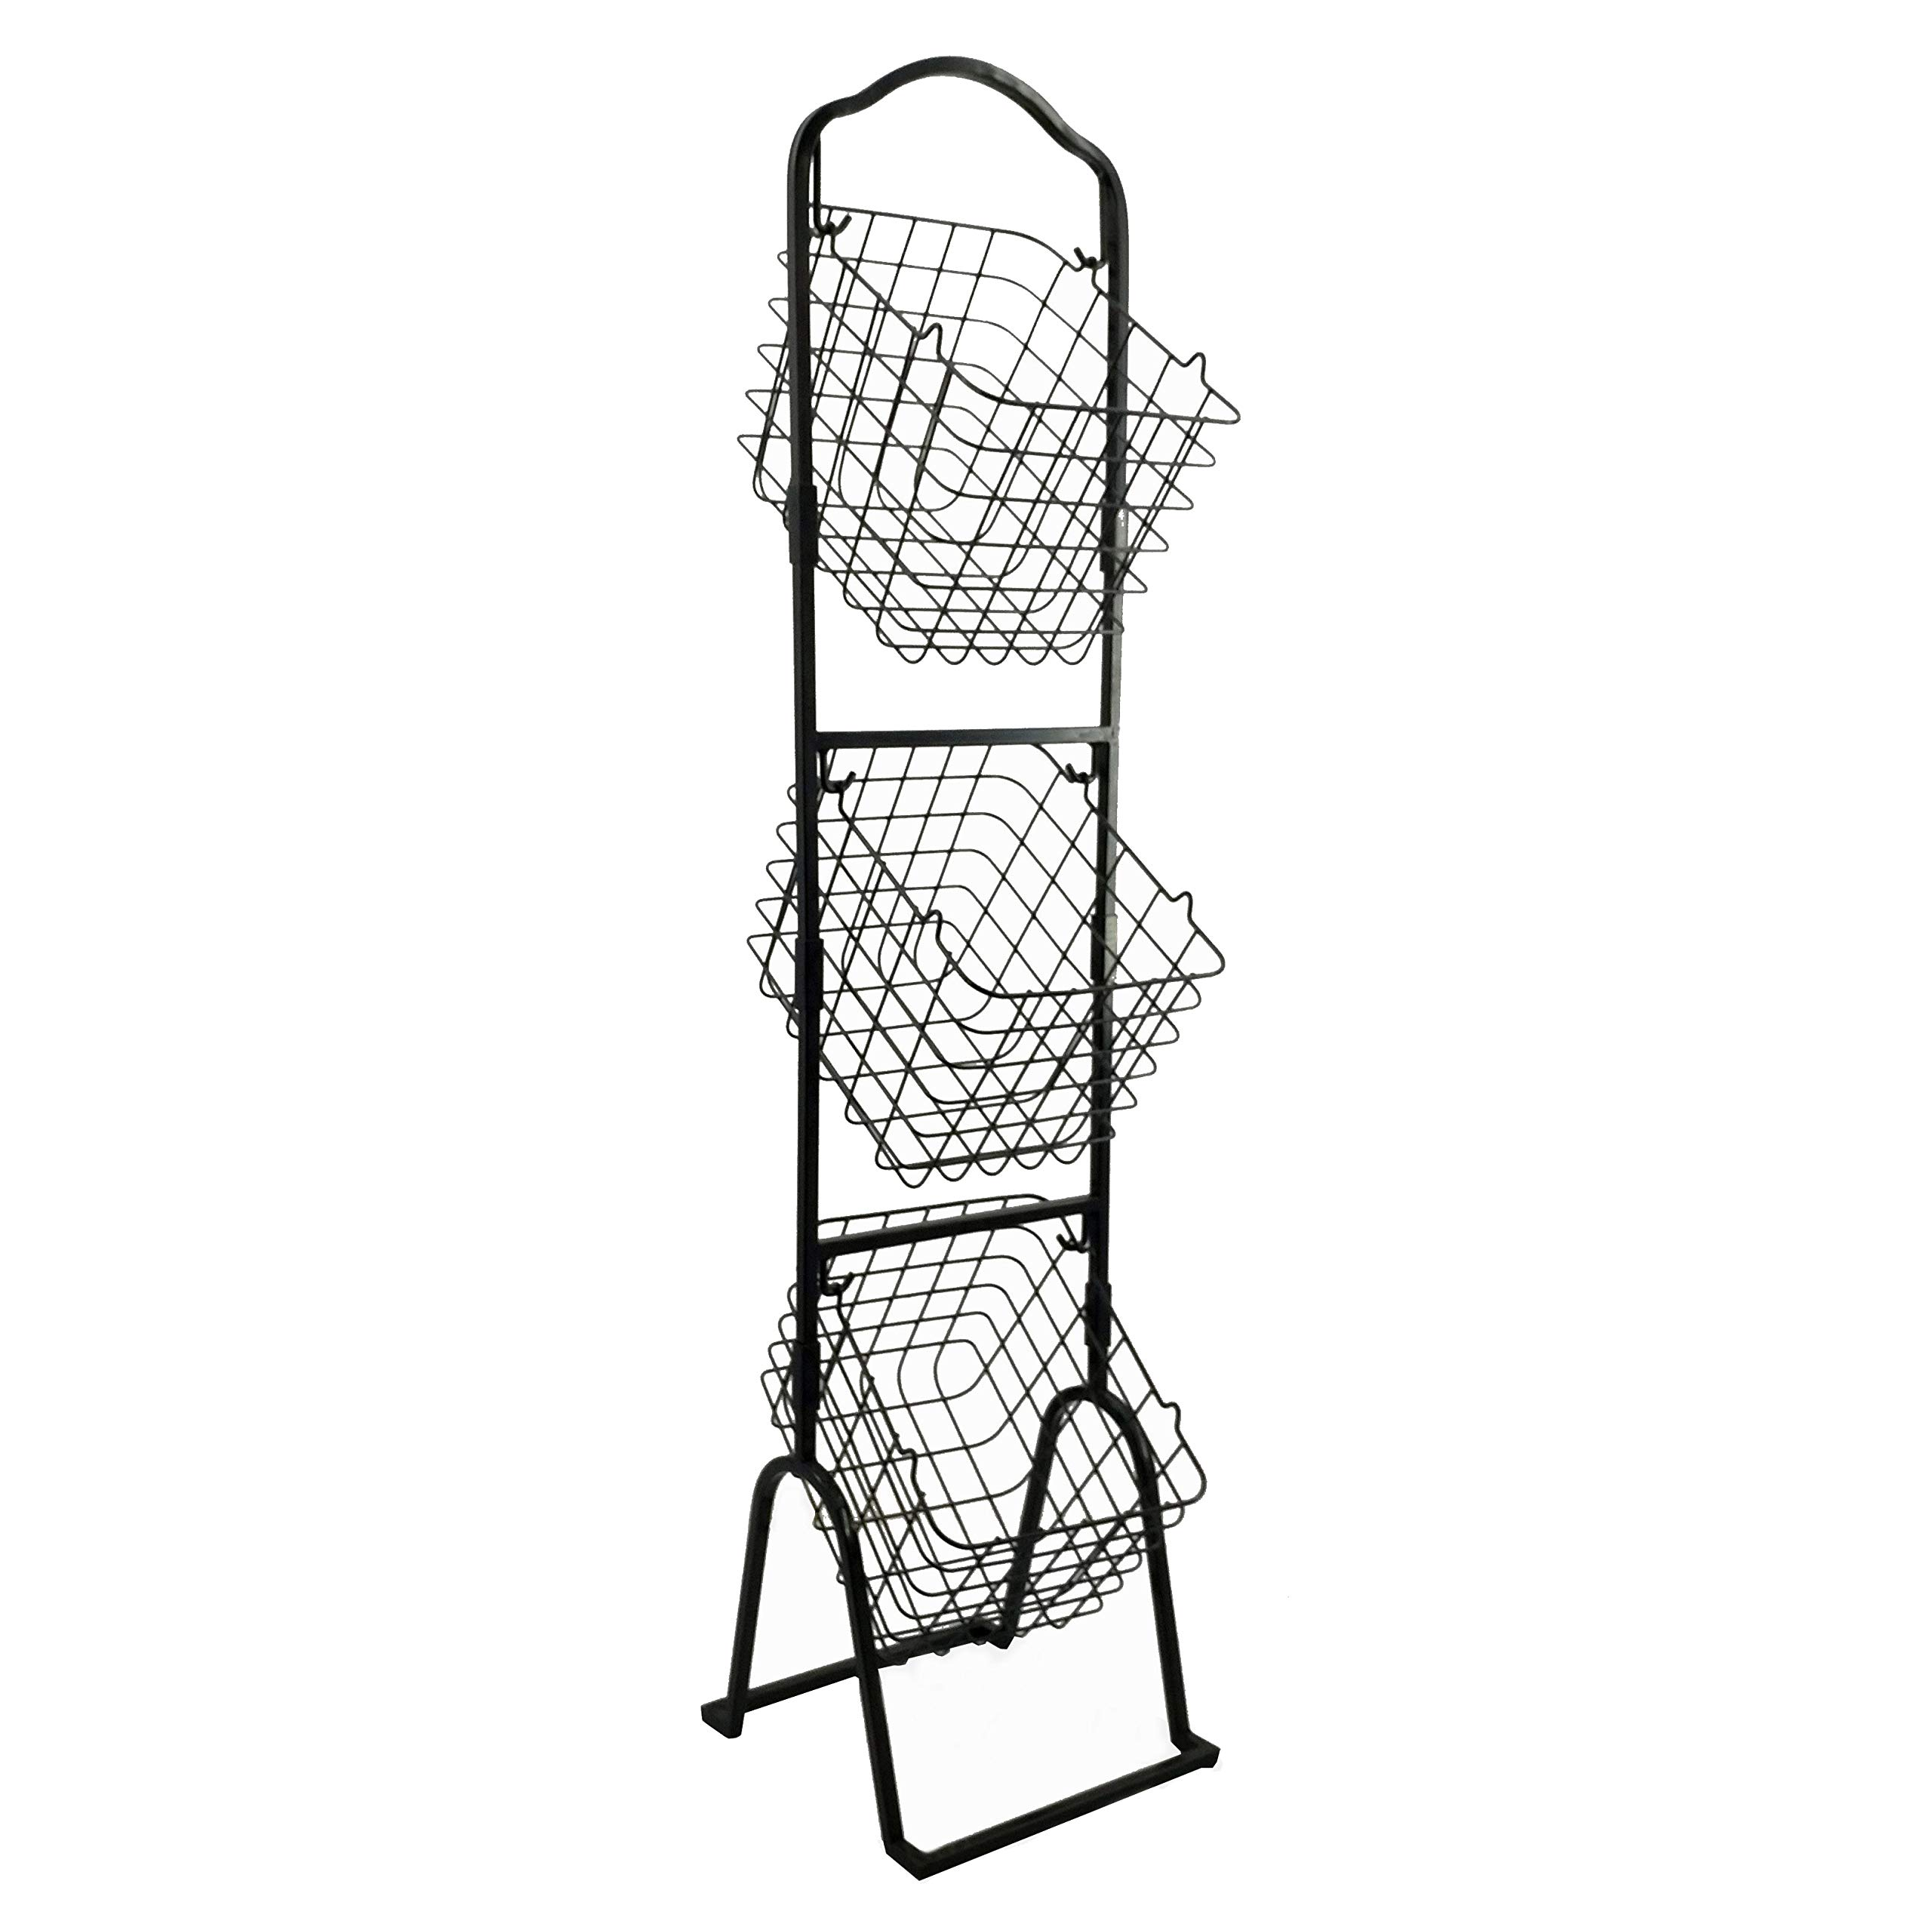 FixtureDisplays 3-Tier Metal Market Basket Display Rack for Stores, Offices, Home Use Black 16787